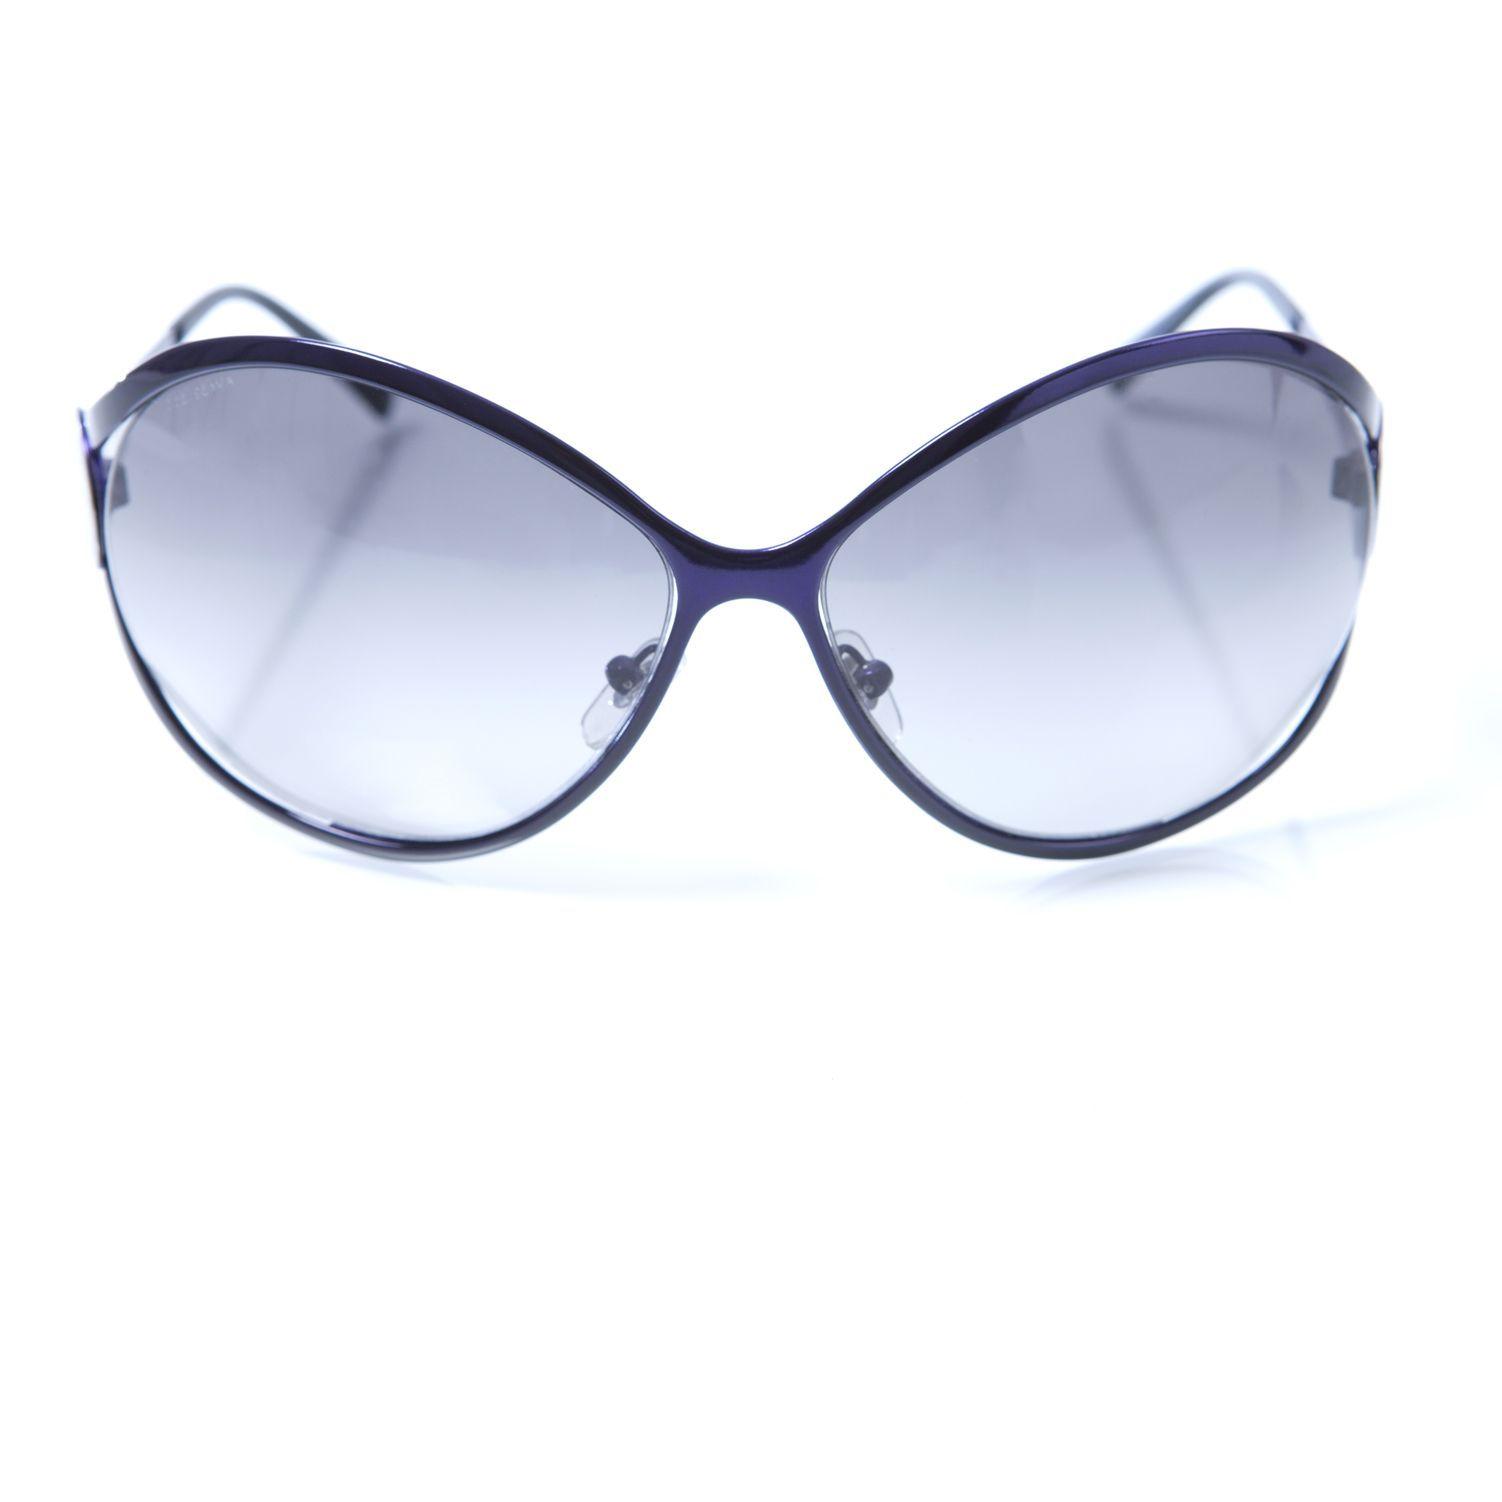 e1d2e06c68 Comprar Gafas de Sol Mujer Versace 2098. Precios Outlet. | Gafas de ...